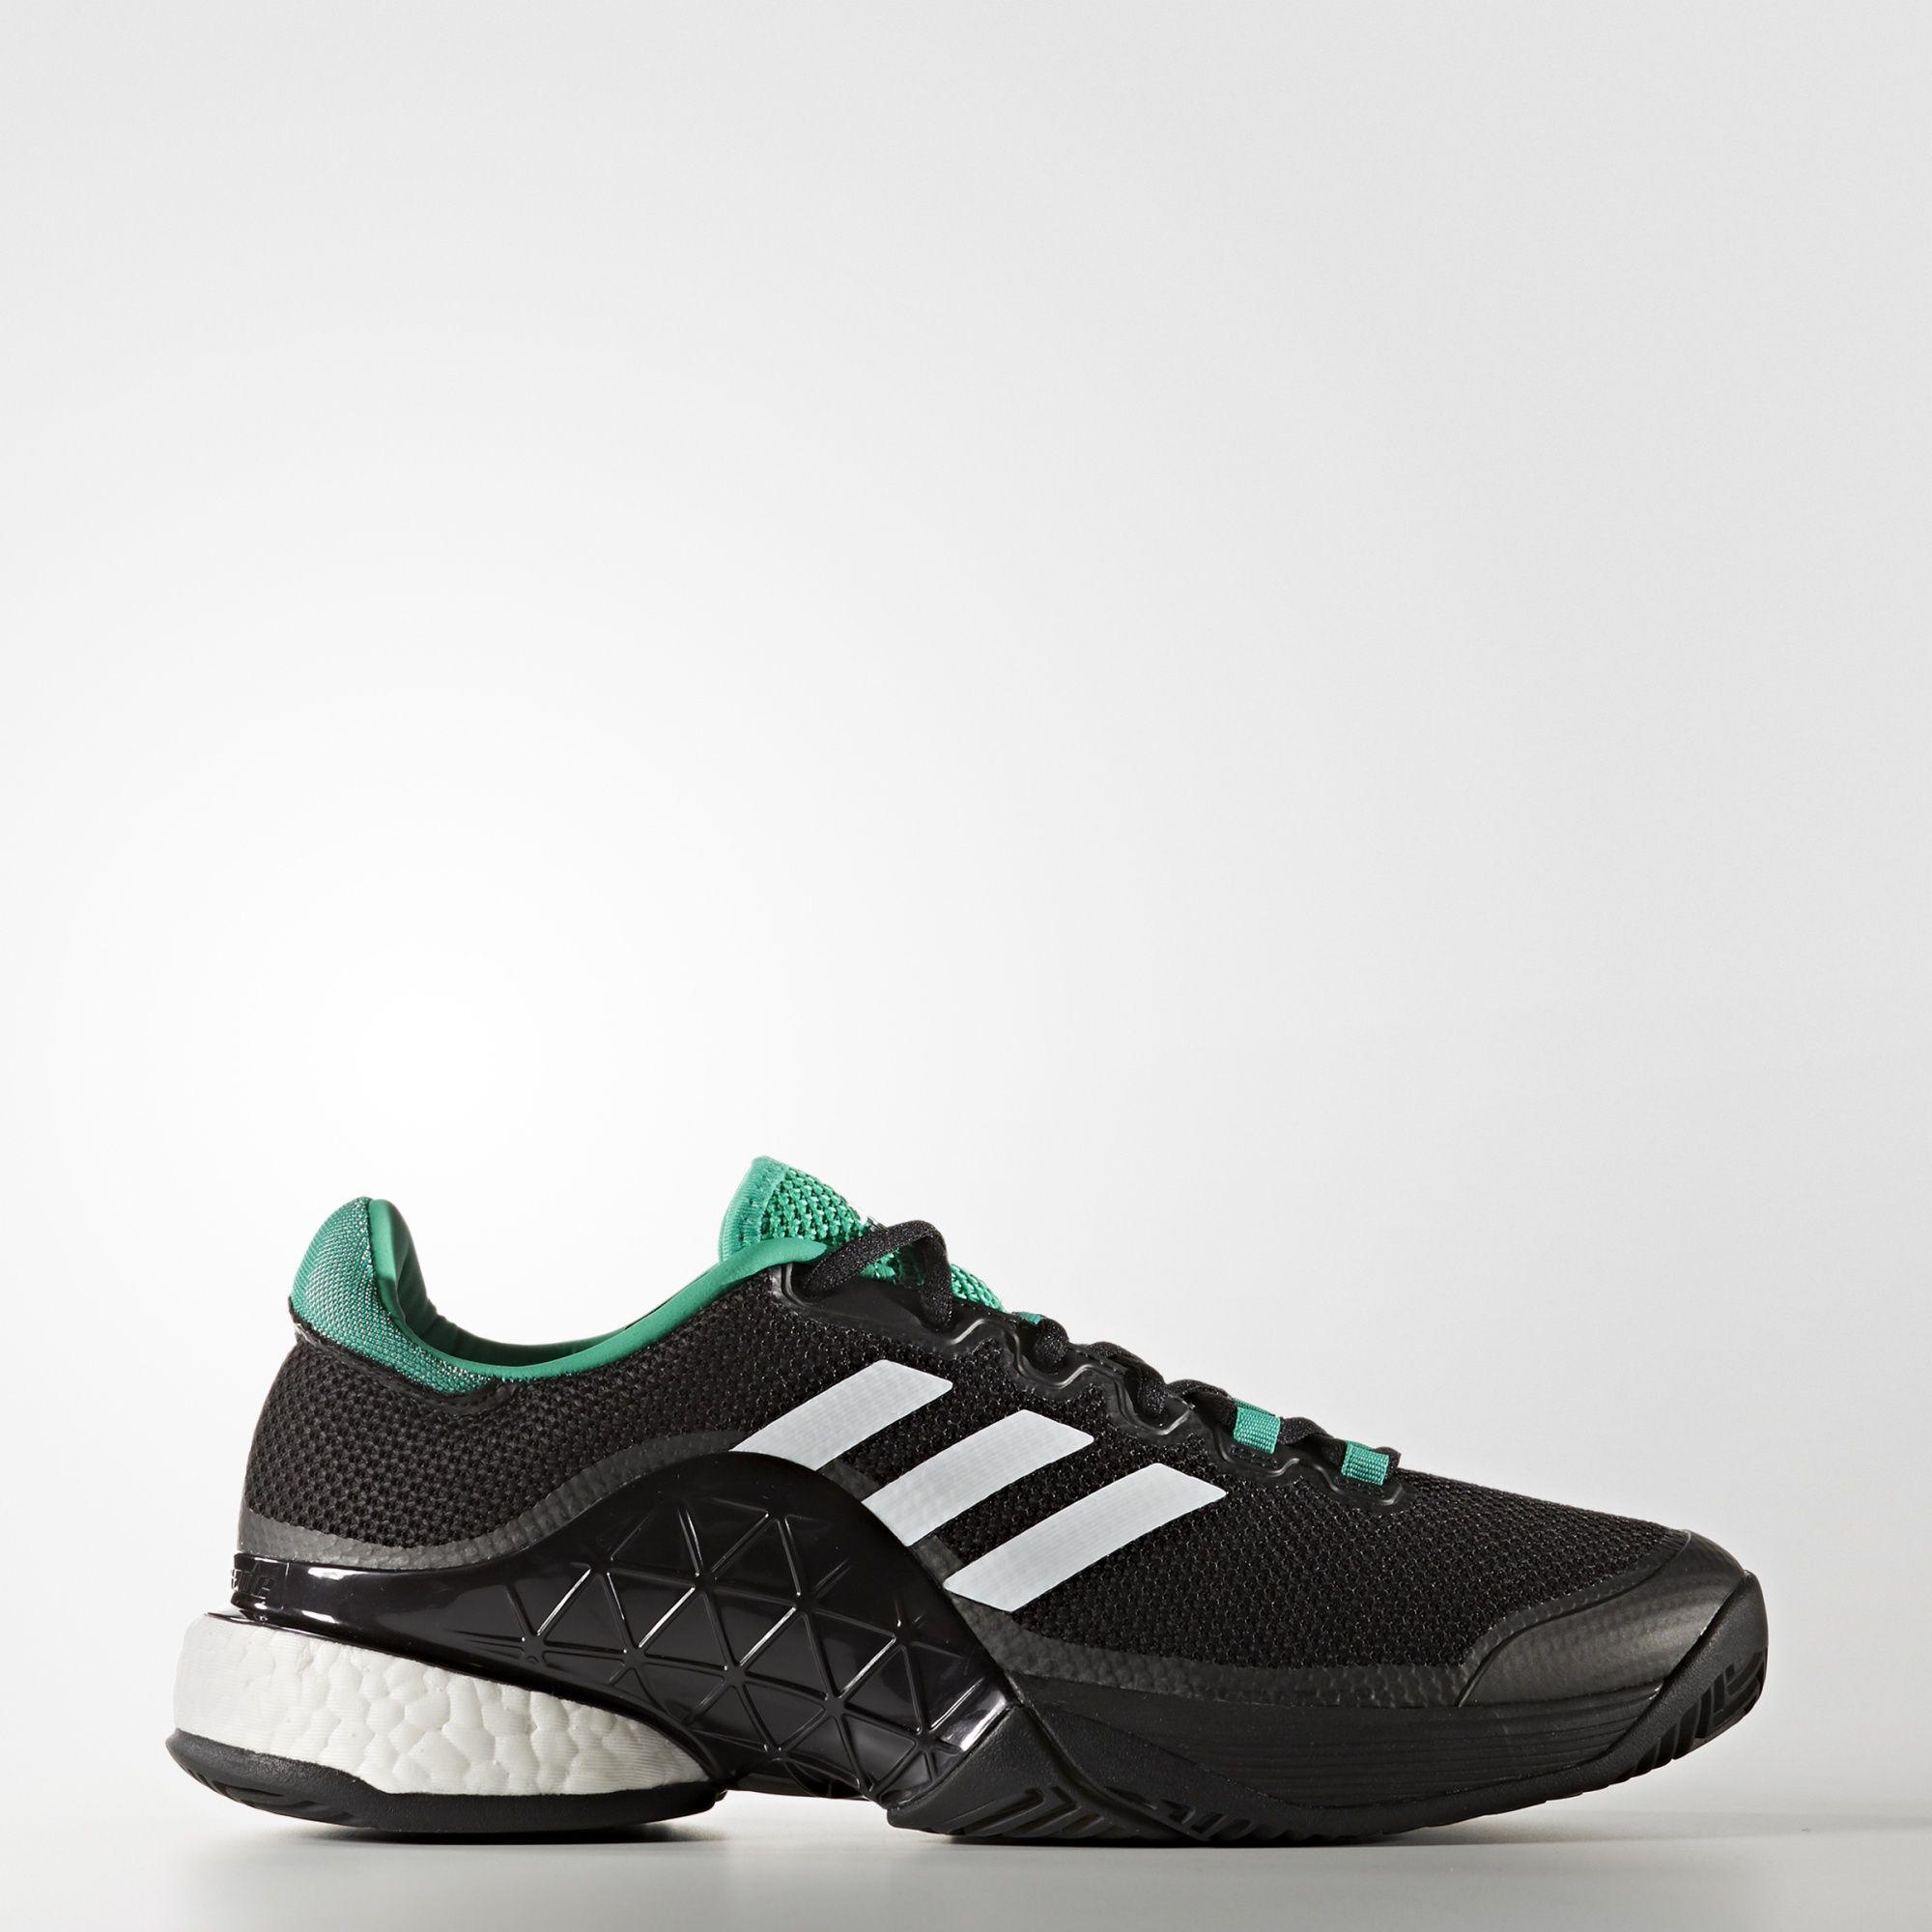 Adidas Uomo barricata impulso 2017, scarpe da tennis nero / verde